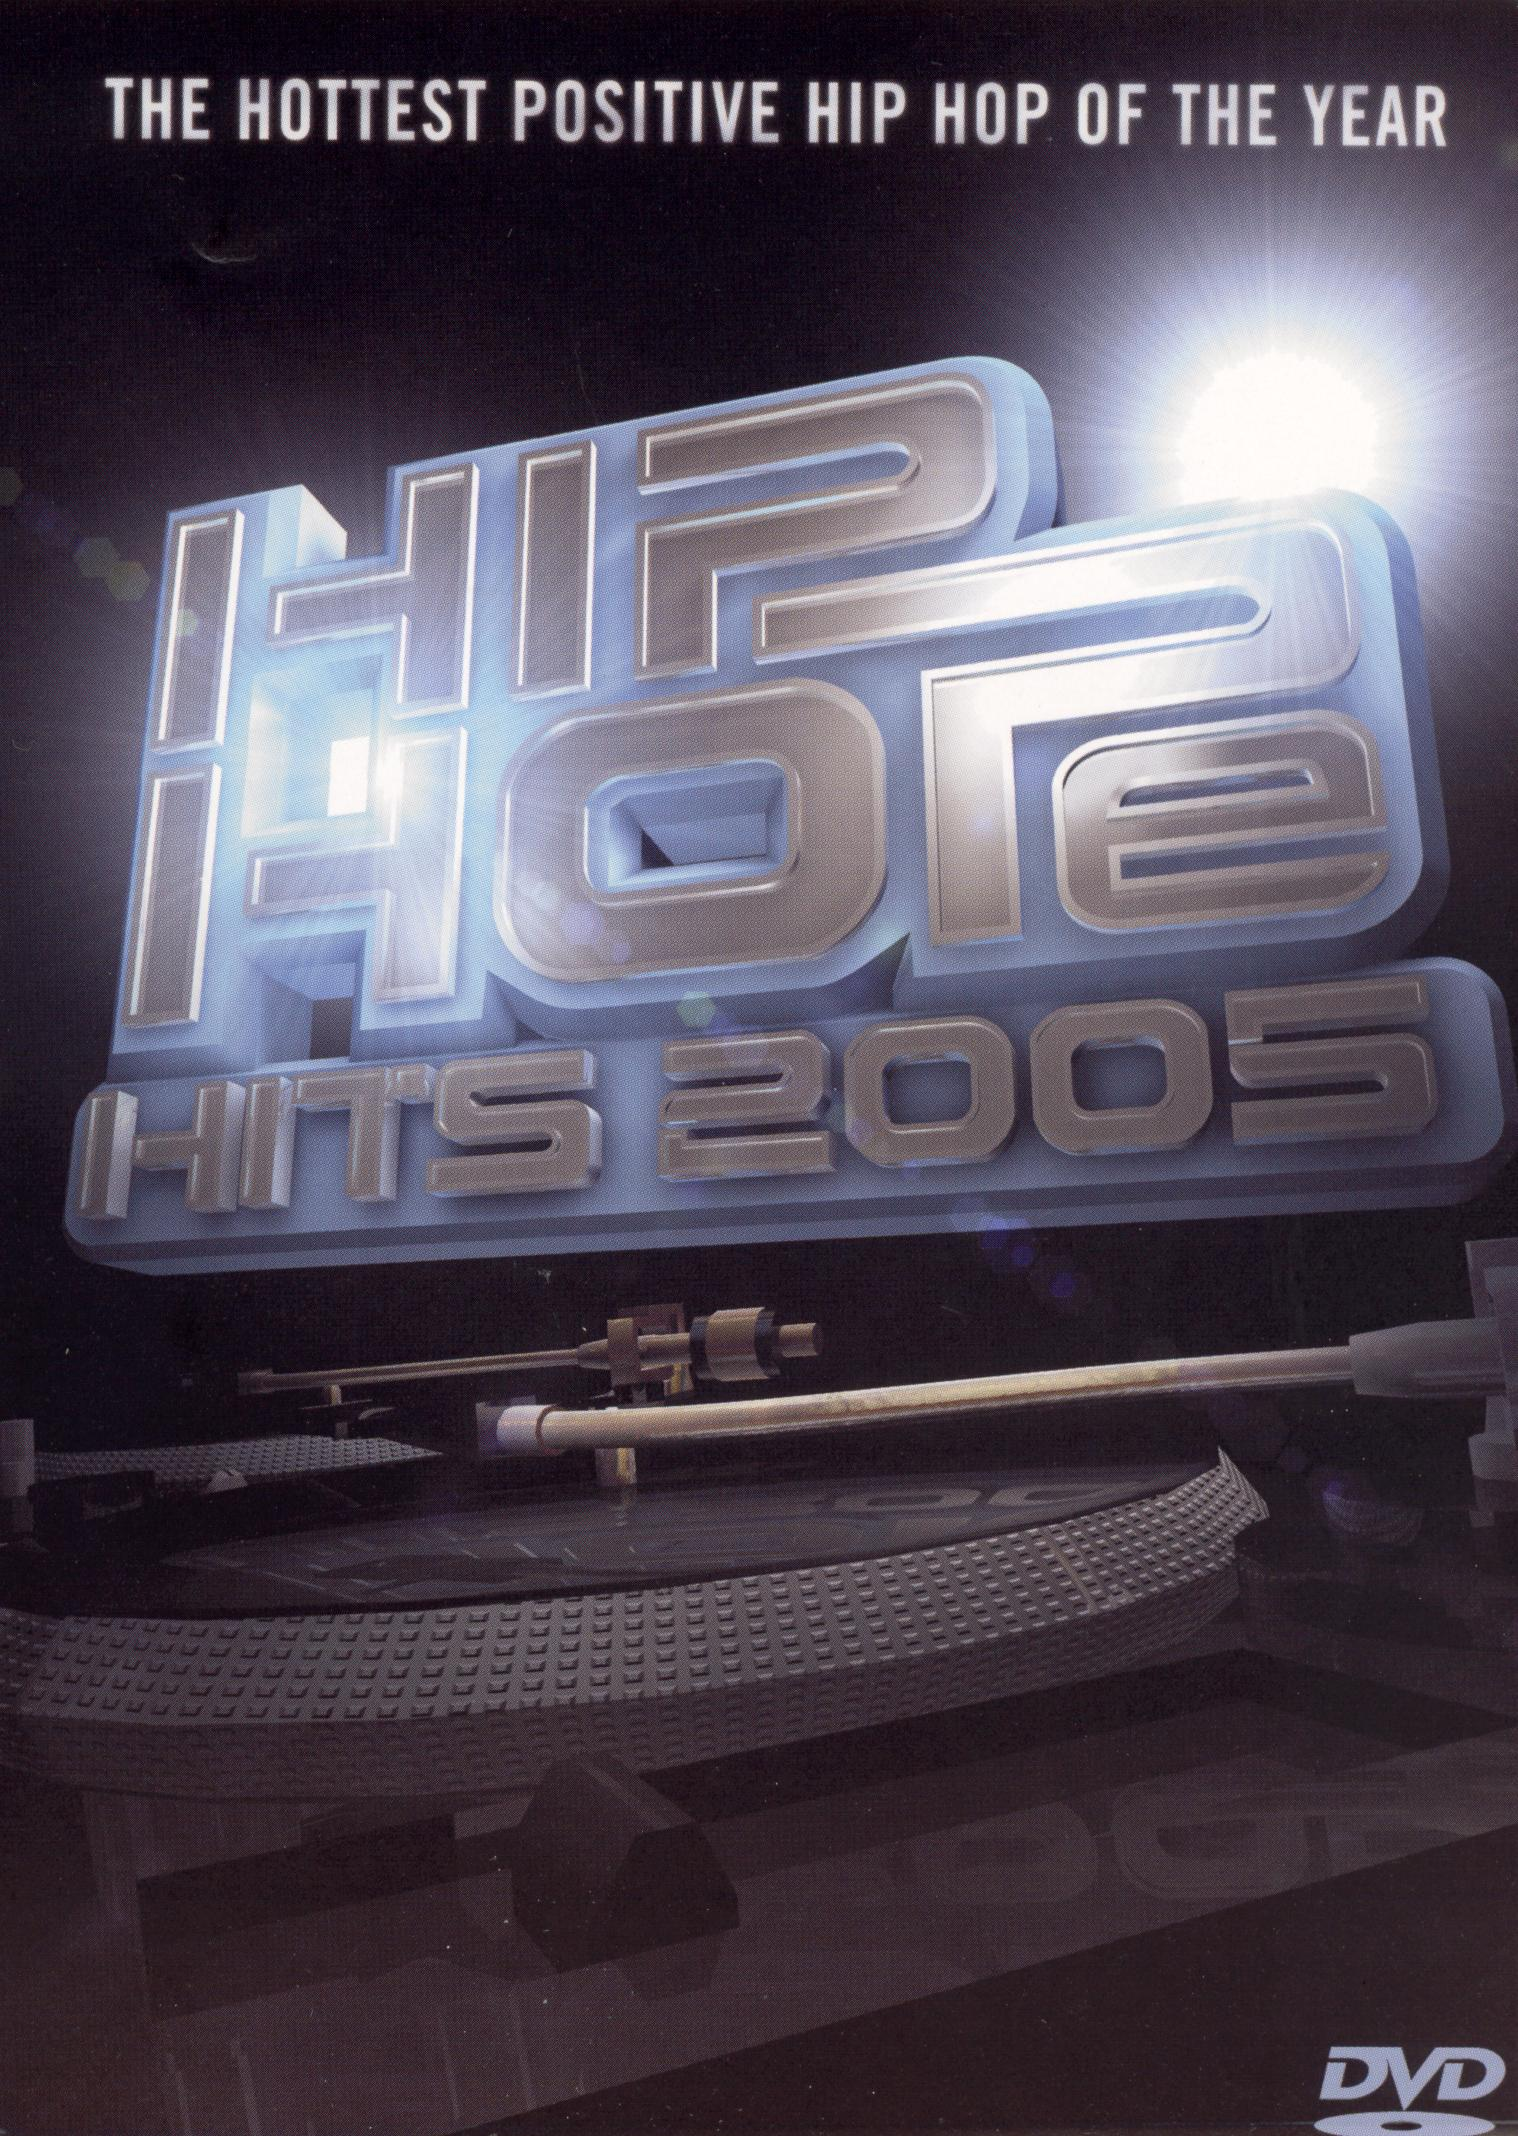 Hip Hope Hits 2005